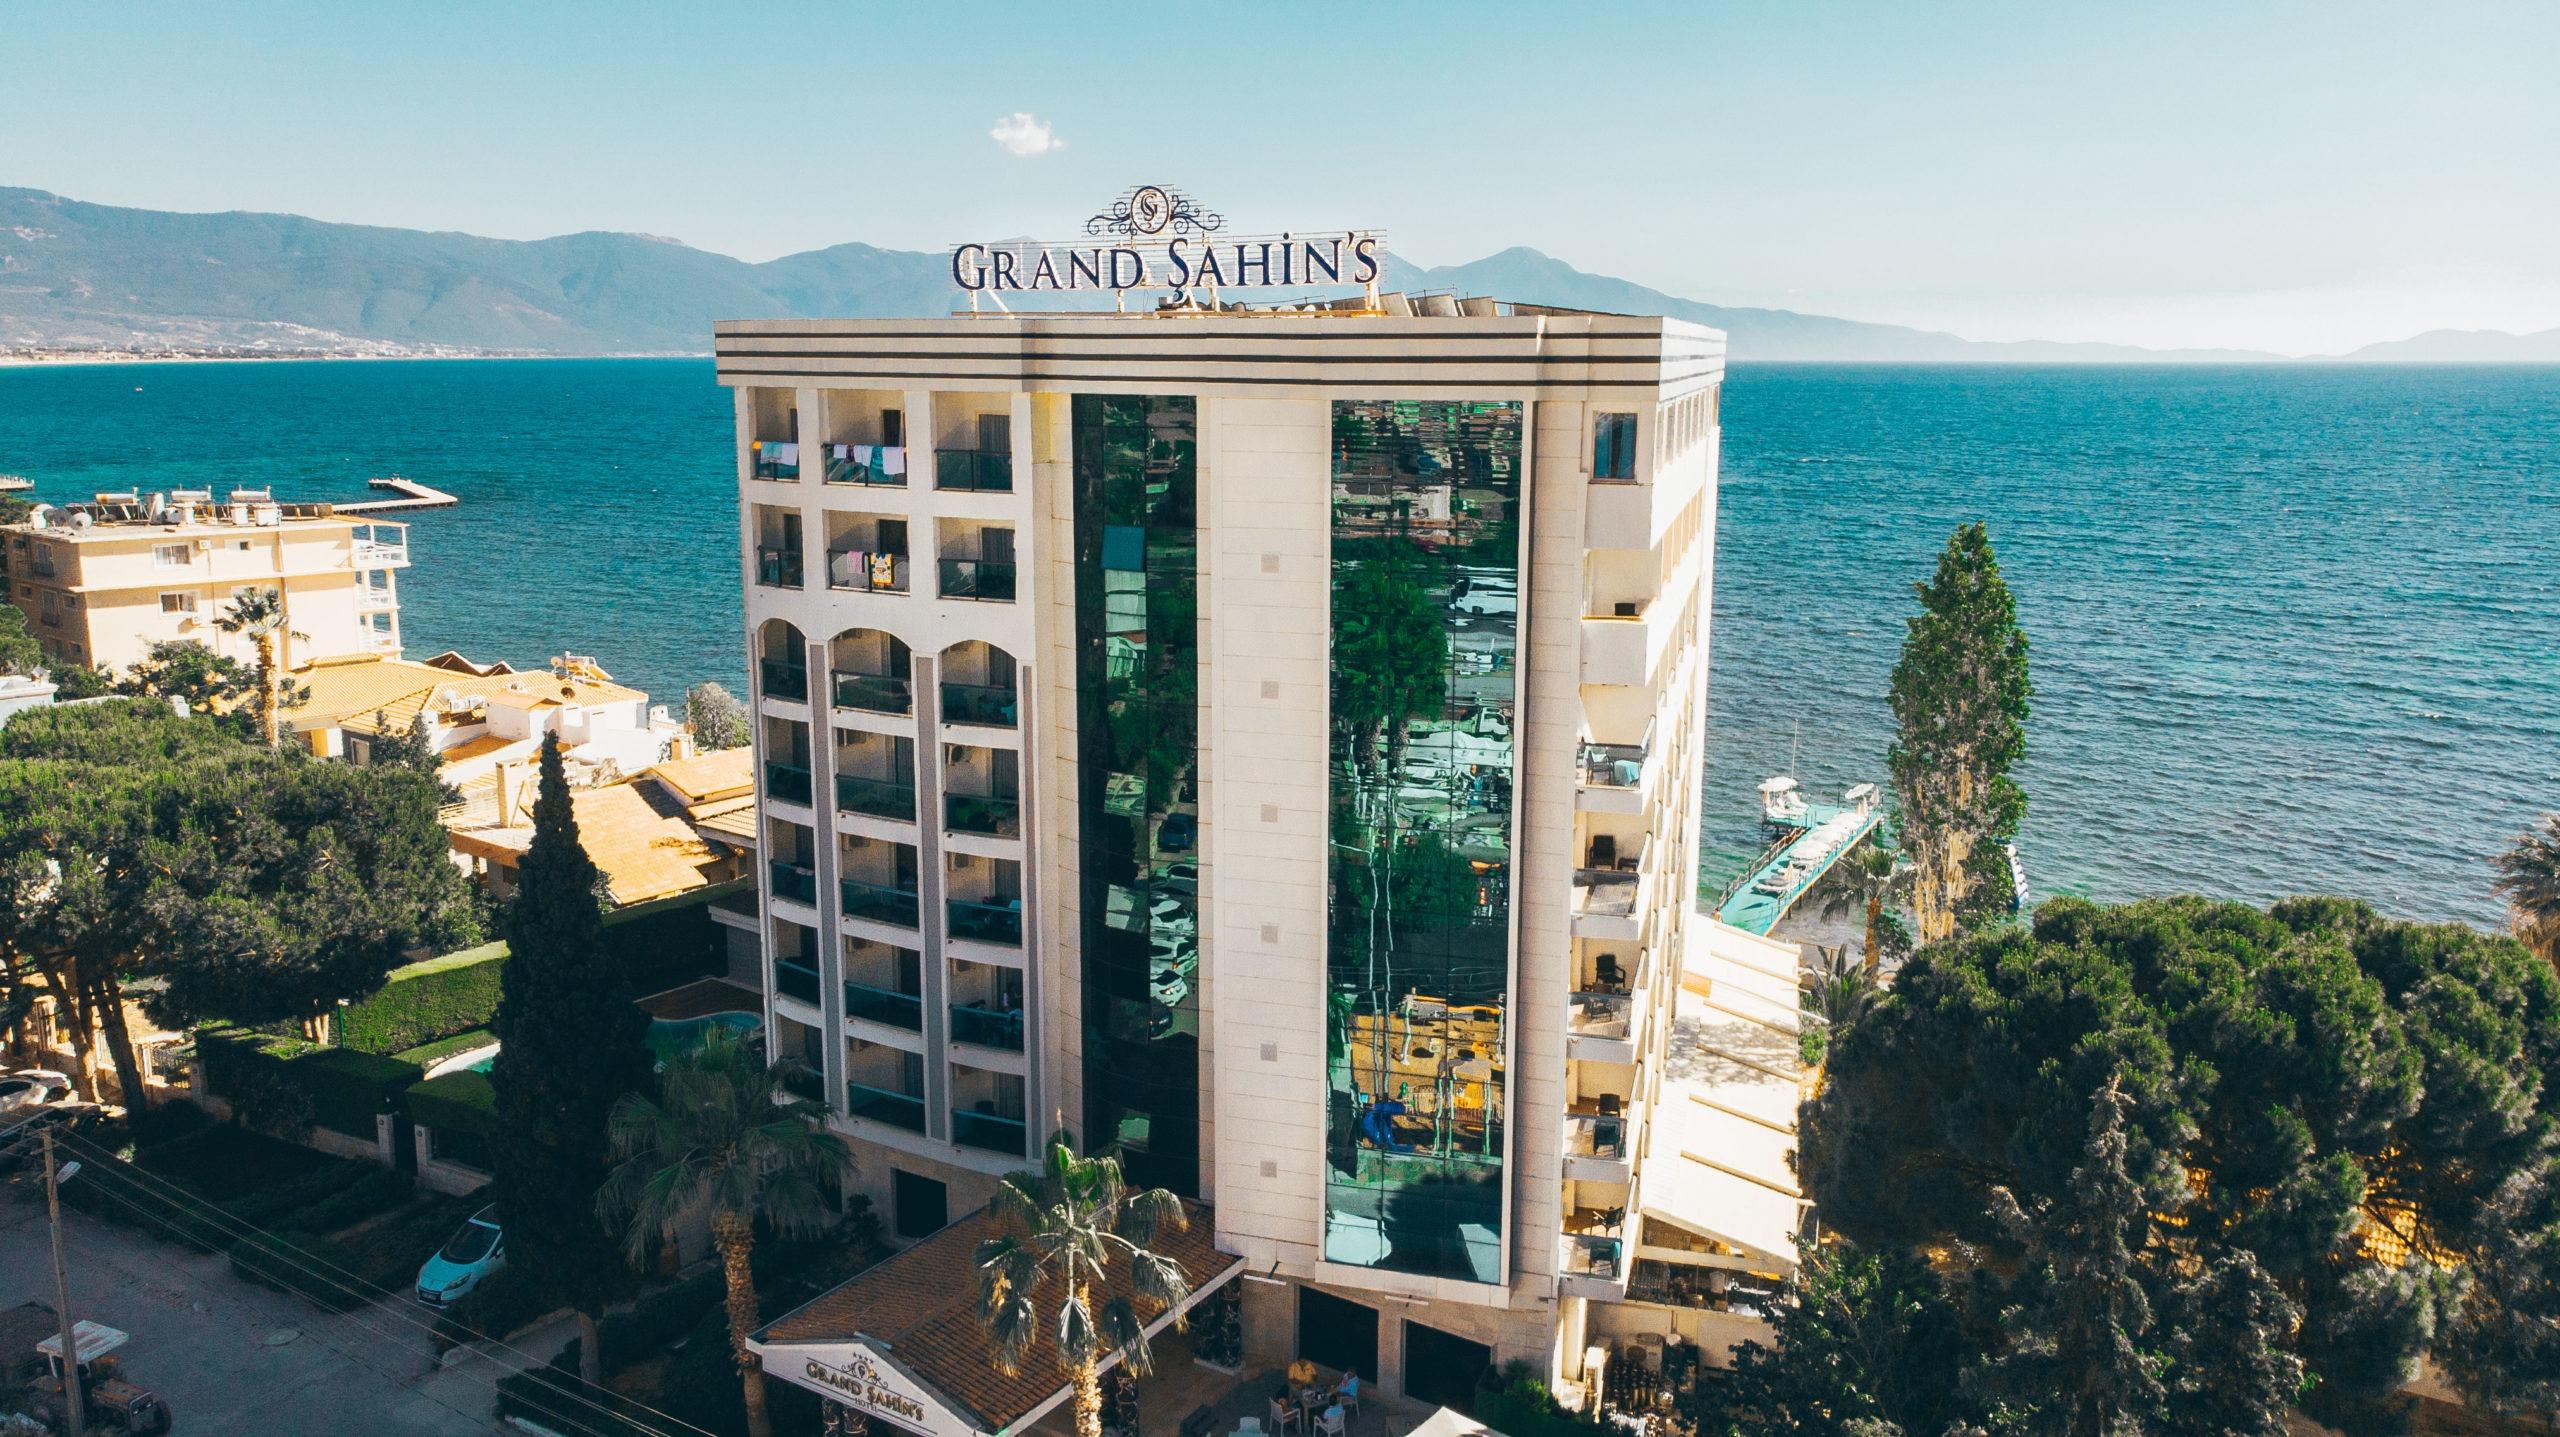 Grand Sahins Hotel